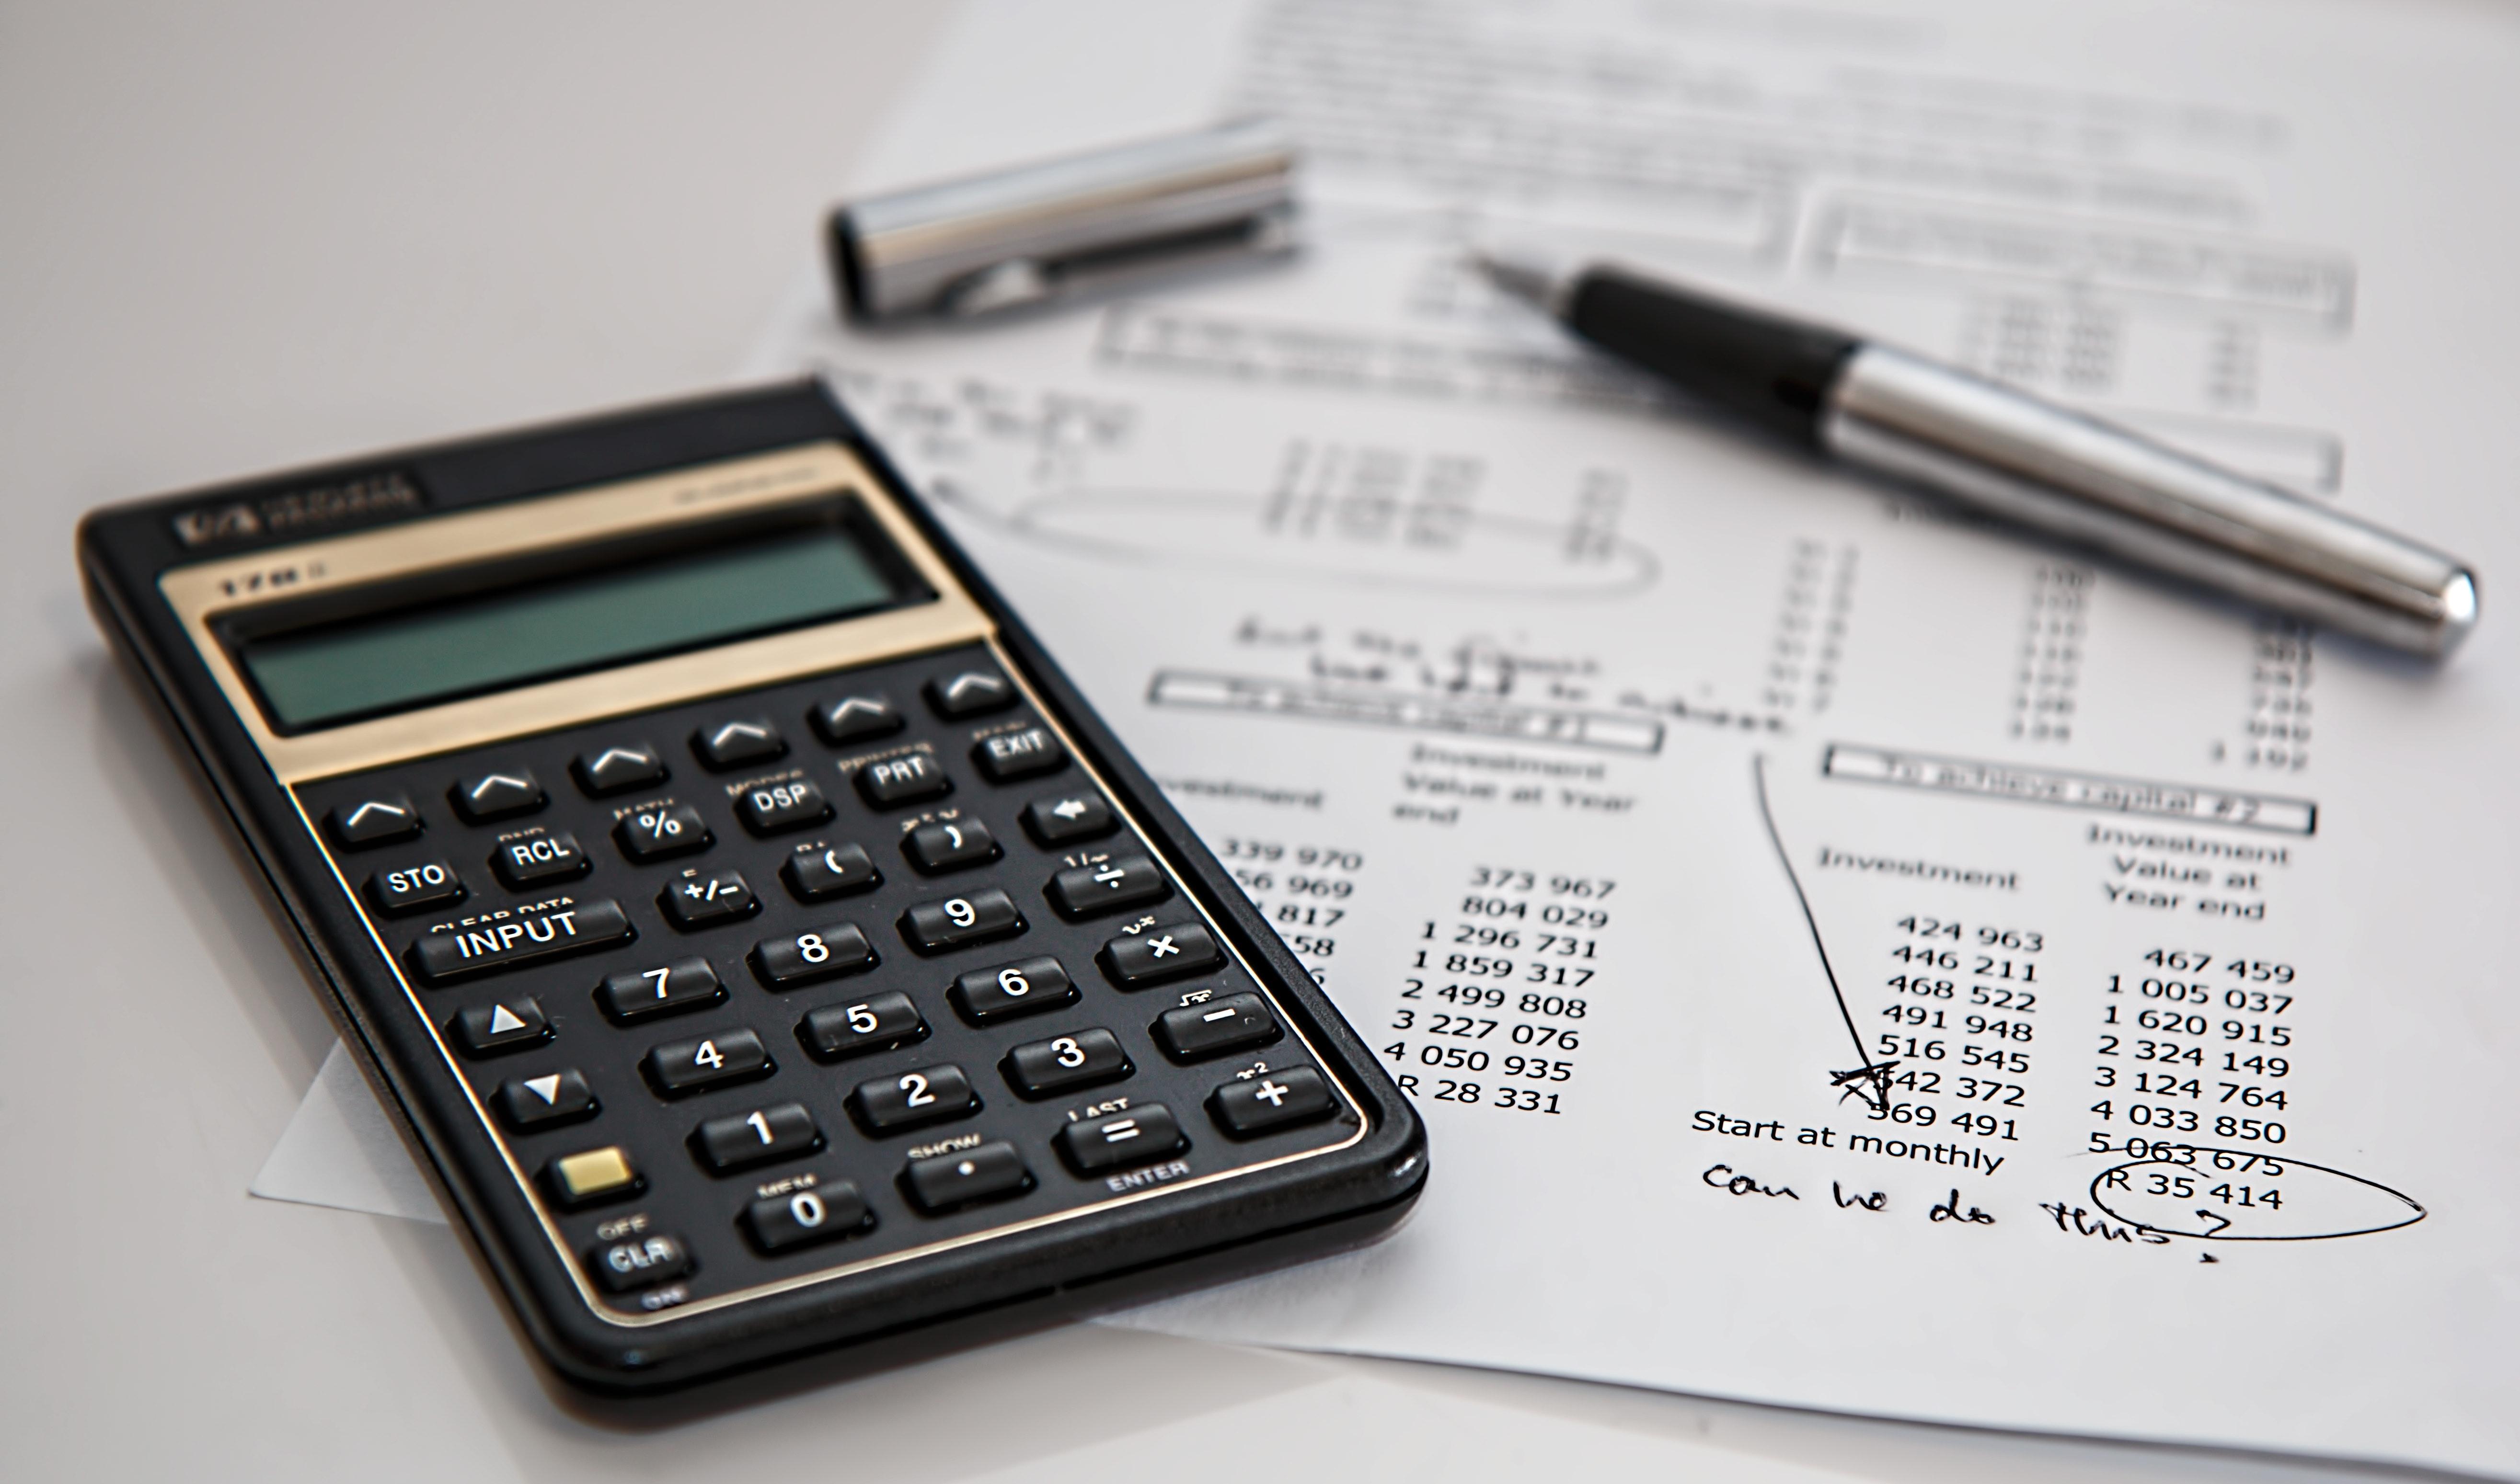 Black calculator near ballpoint pen on chargeback claim